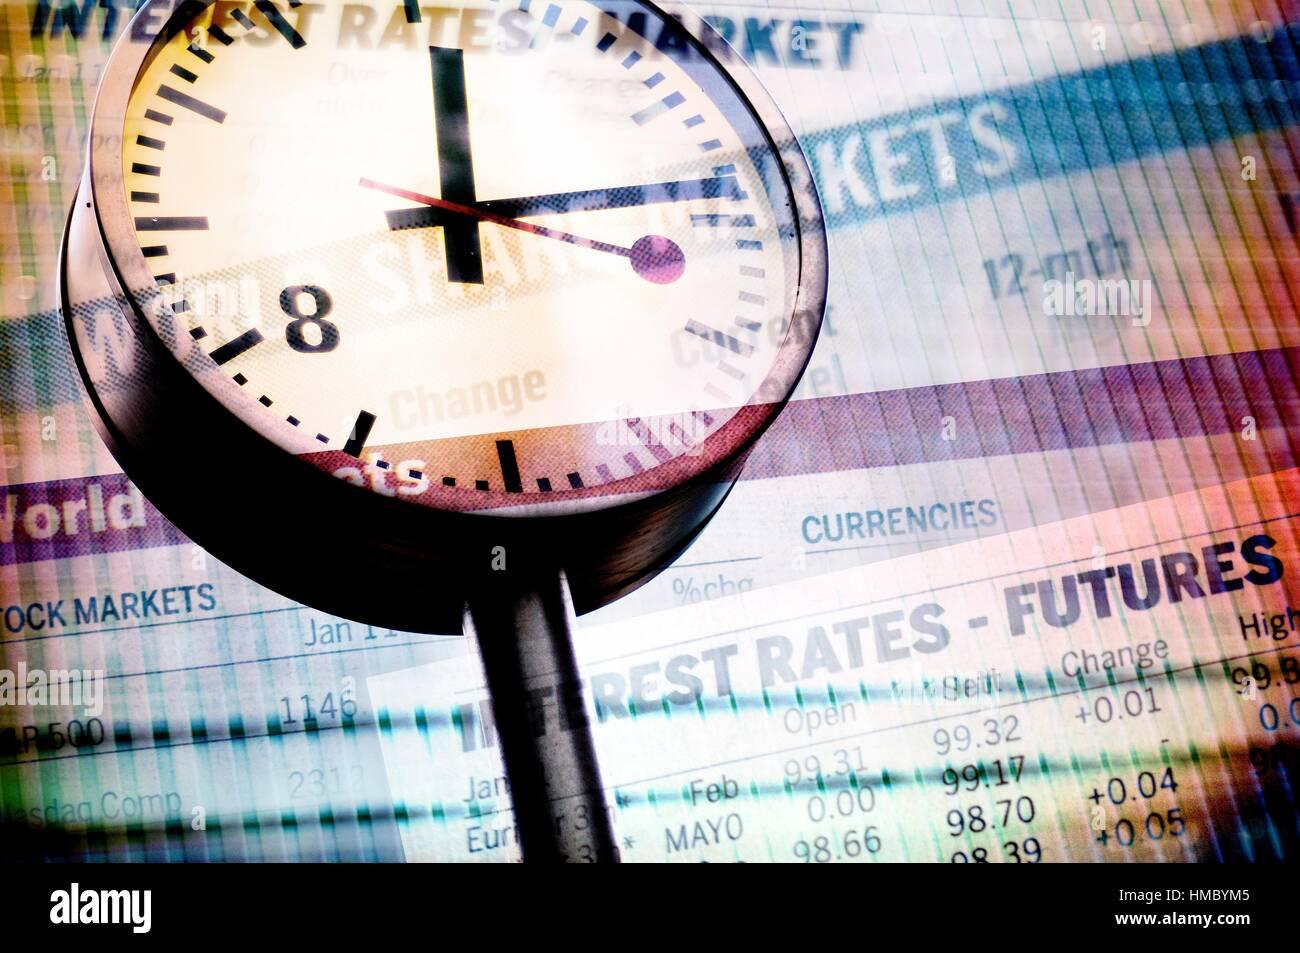 Mercado bursatil, bolsa de valores, Market rate, stock market. Stock Photo